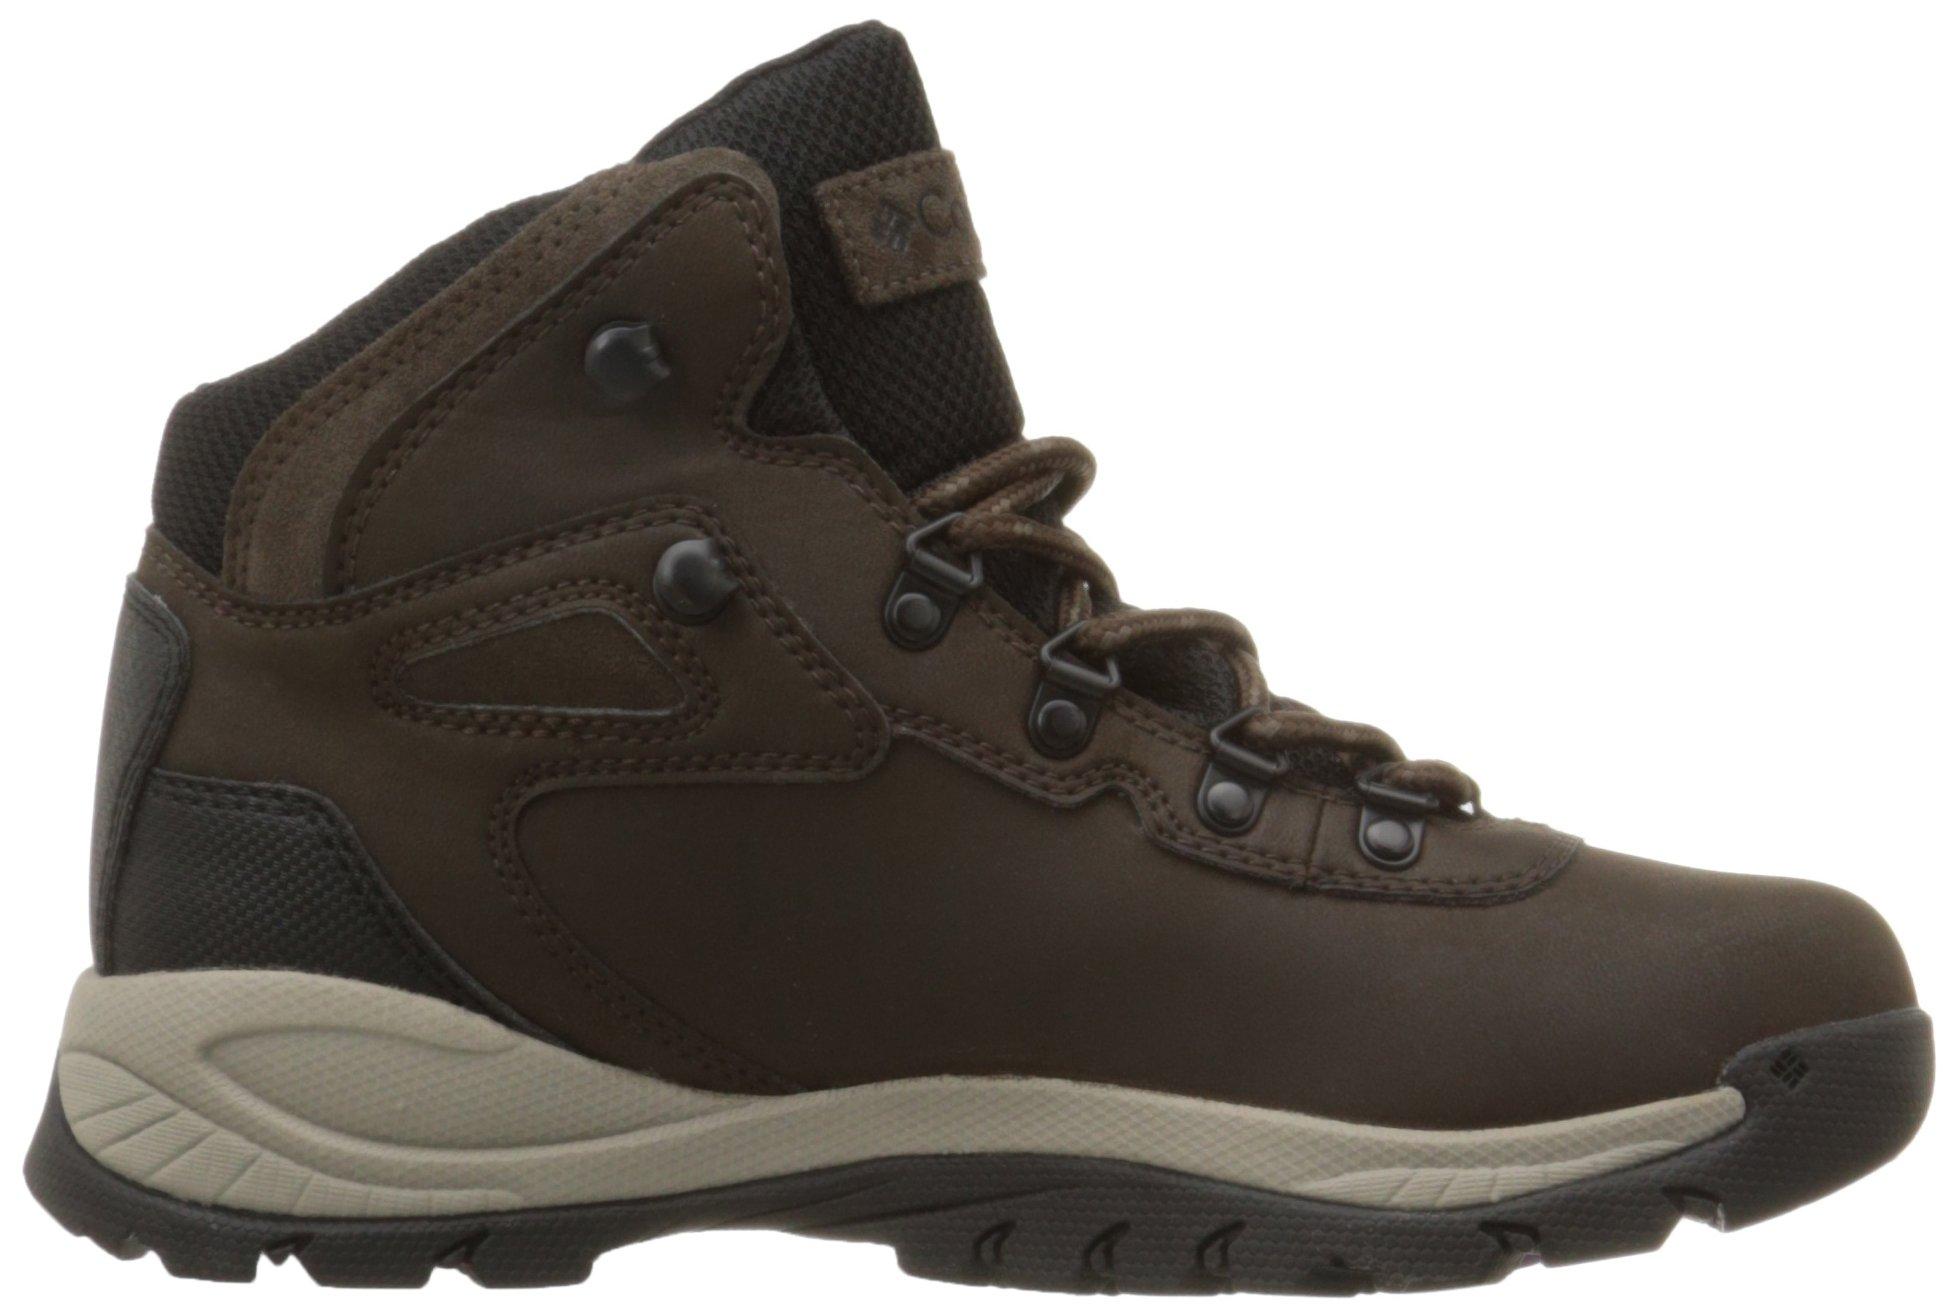 Columbia Women's Newton Ridge Plus Hiking Boot, Cordovan/Crown Jewel, 6 Regular US by Columbia (Image #7)